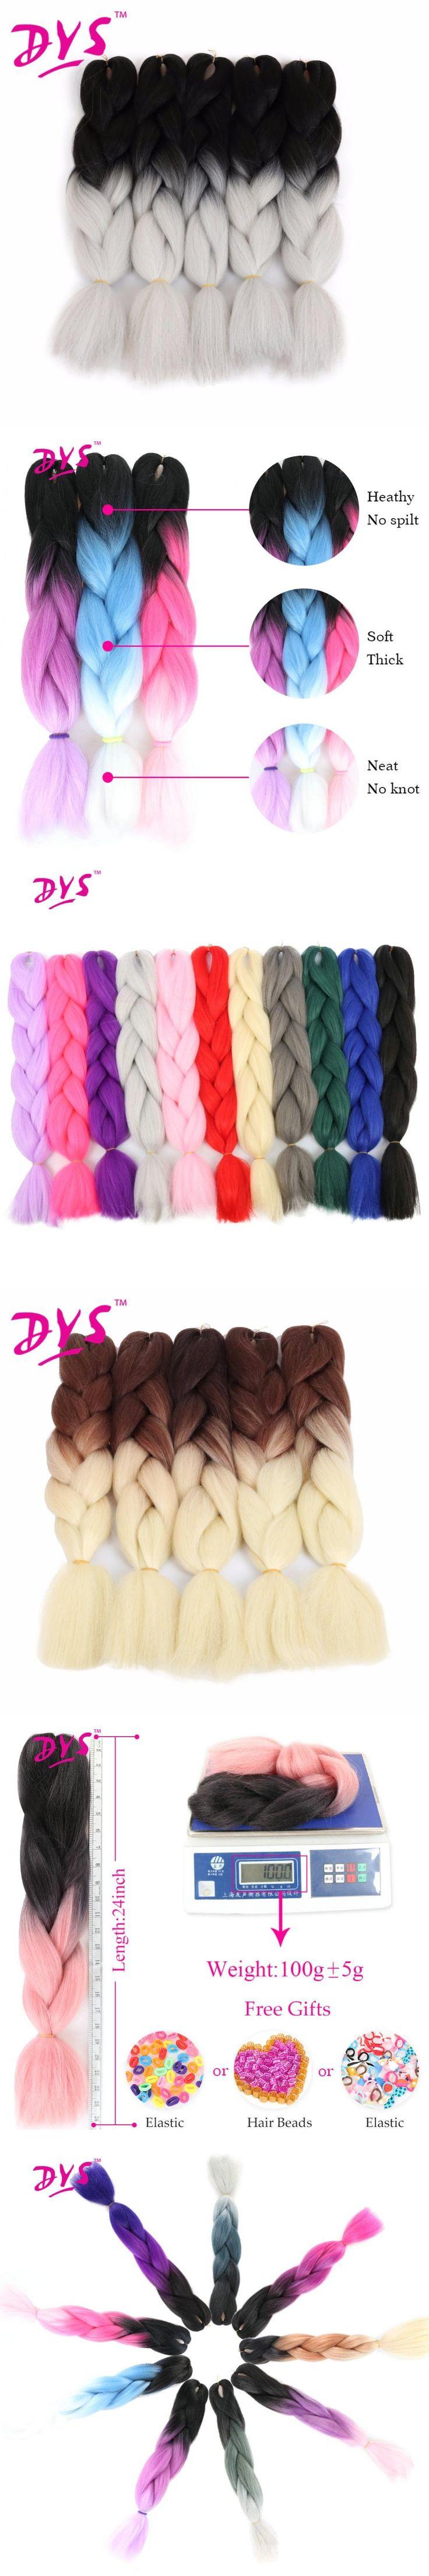 Deyngs Ombre Kanekalon Braiding Hair Extensions Two/Three Tone Synthetic Kinky Twist Braid Hair 24Inch 100g/pcs Heat Resistant